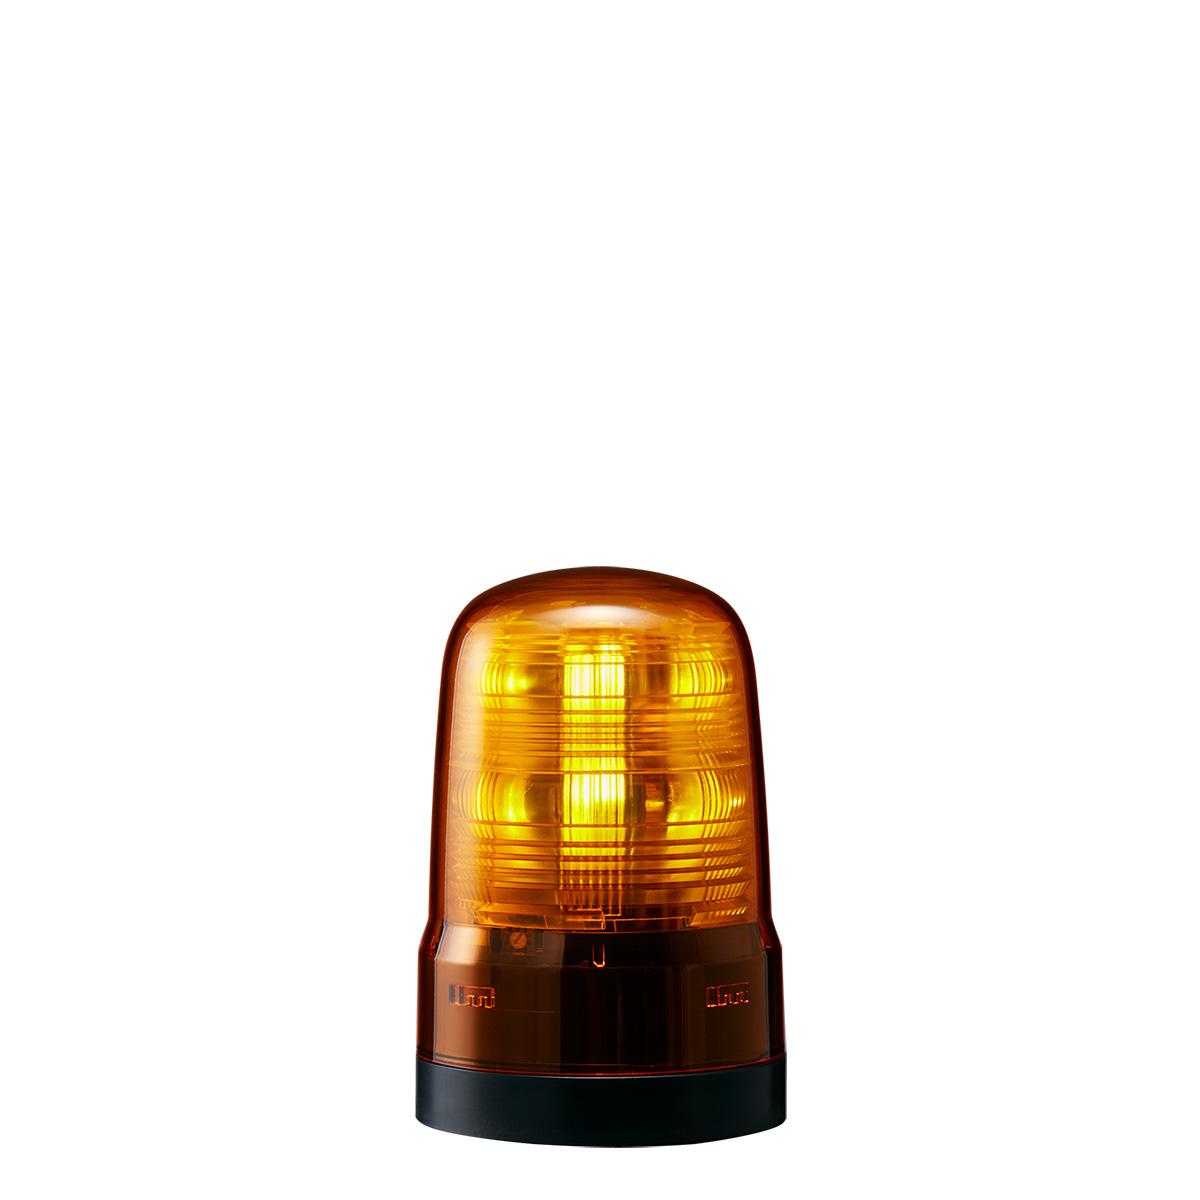 SF08M2KTNY AC100~240V イエロー(黄色) ※受注生産品 プッシュイン端子台・2点穴取付 8.5W φ80mm LED回転灯(モータレス回転灯) SF パトライト